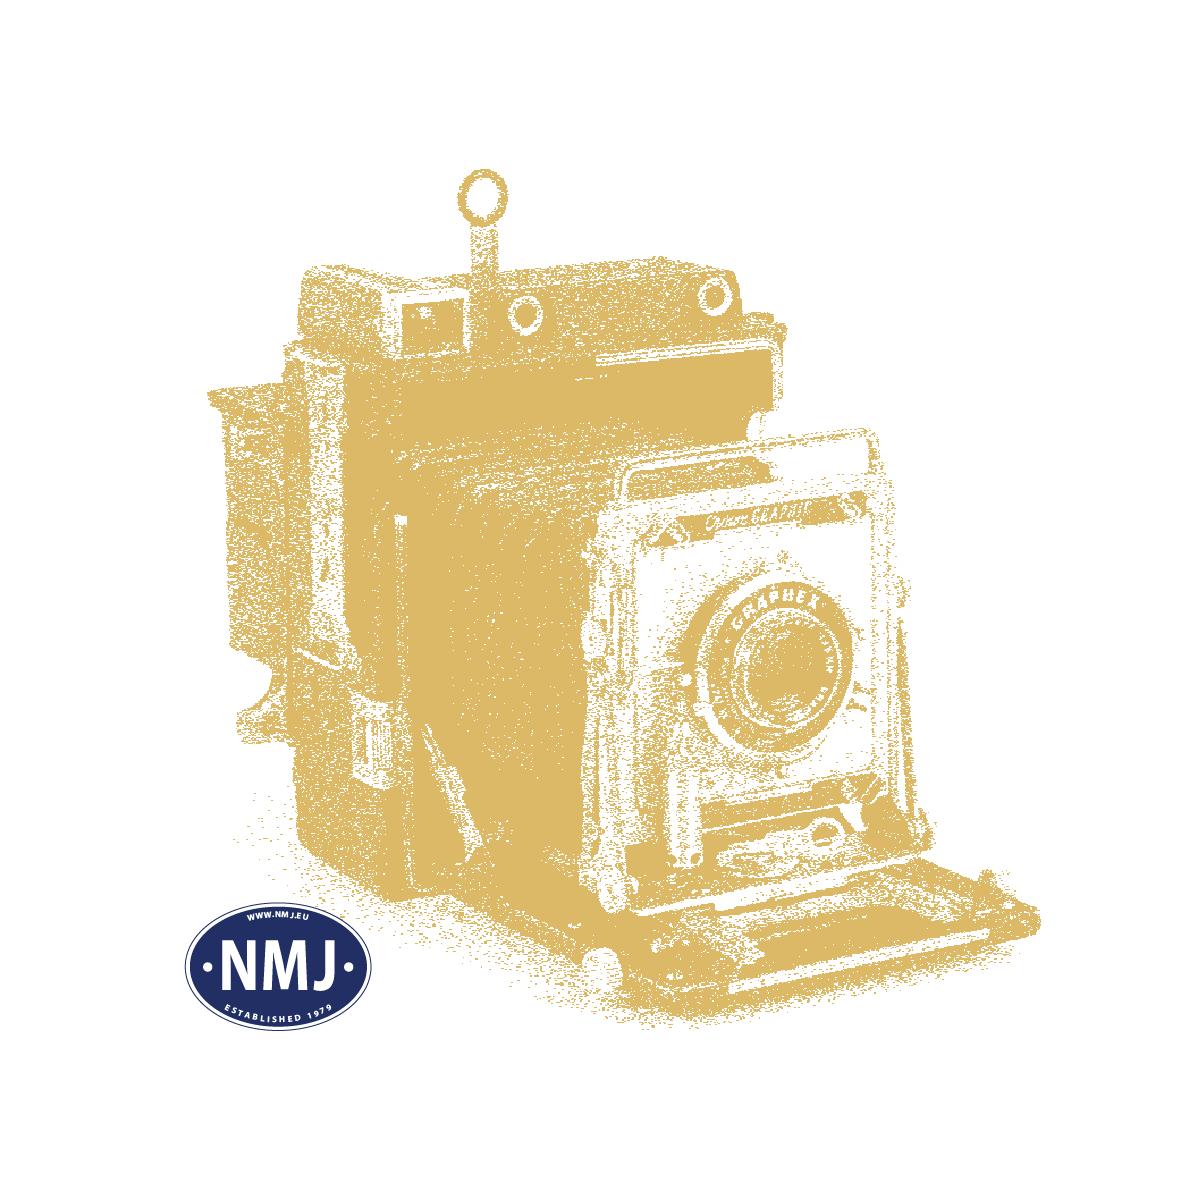 MBR55-1004 - Gressmatte #4, 30 x 40 Cm